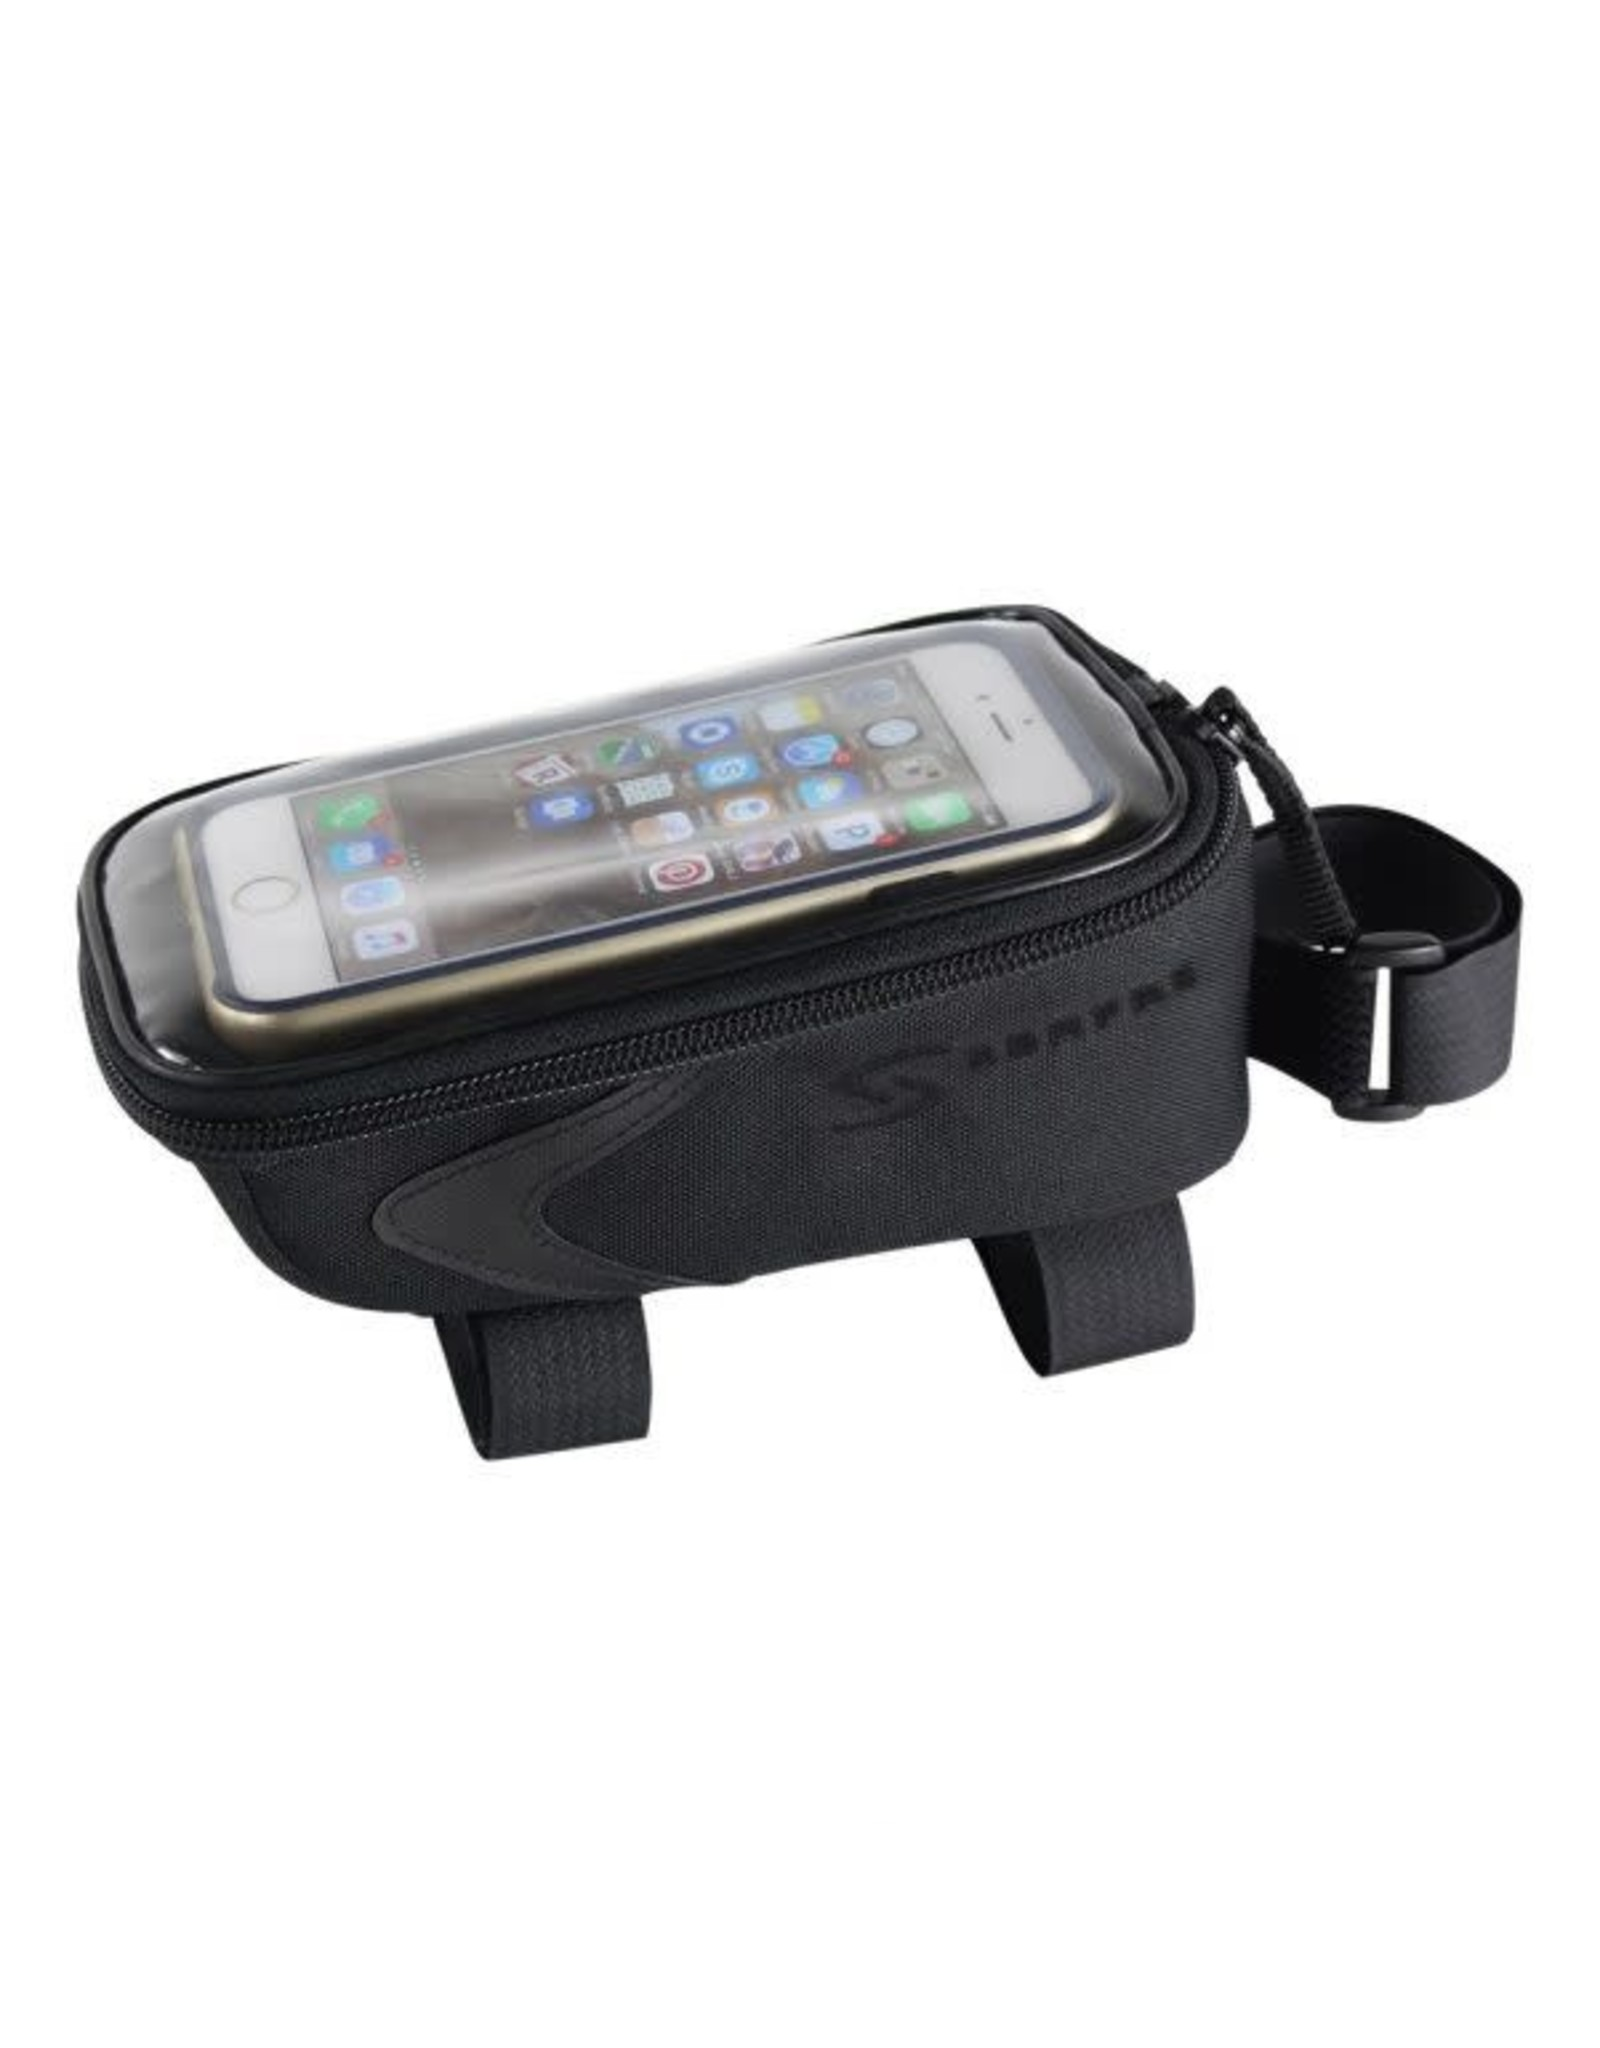 Serfas Bag Serfas Cell Phone Top Tube 6+